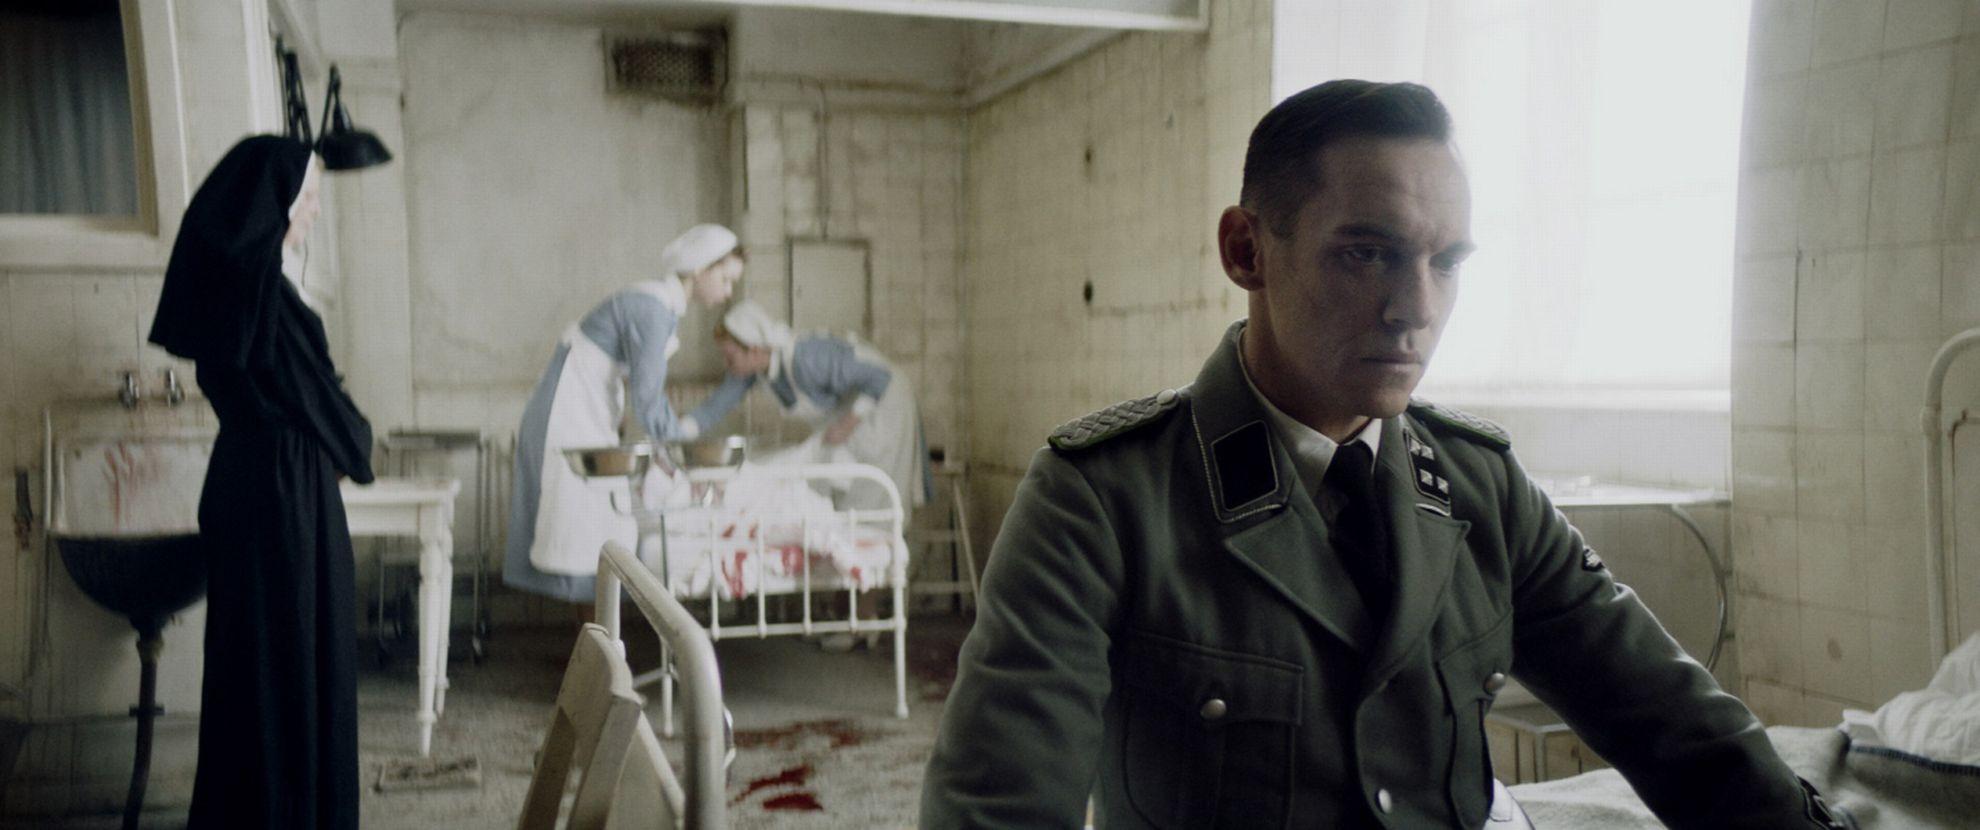 Jonathan Rhys Meyers in Den 12. mann (2017)